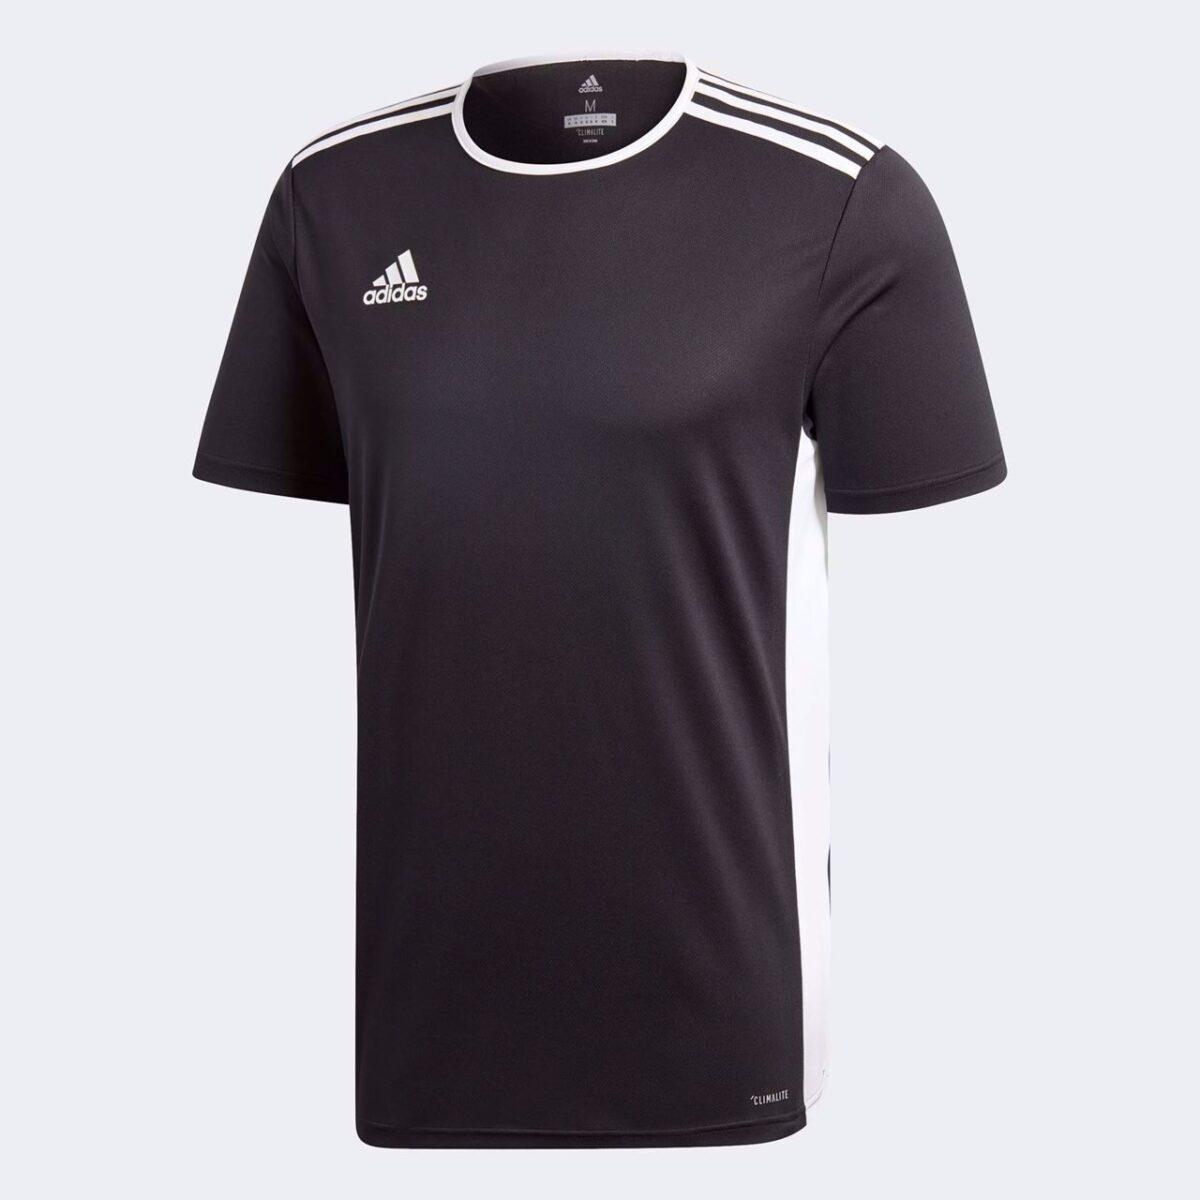 Adidas Entrada 18 Shirt Adult